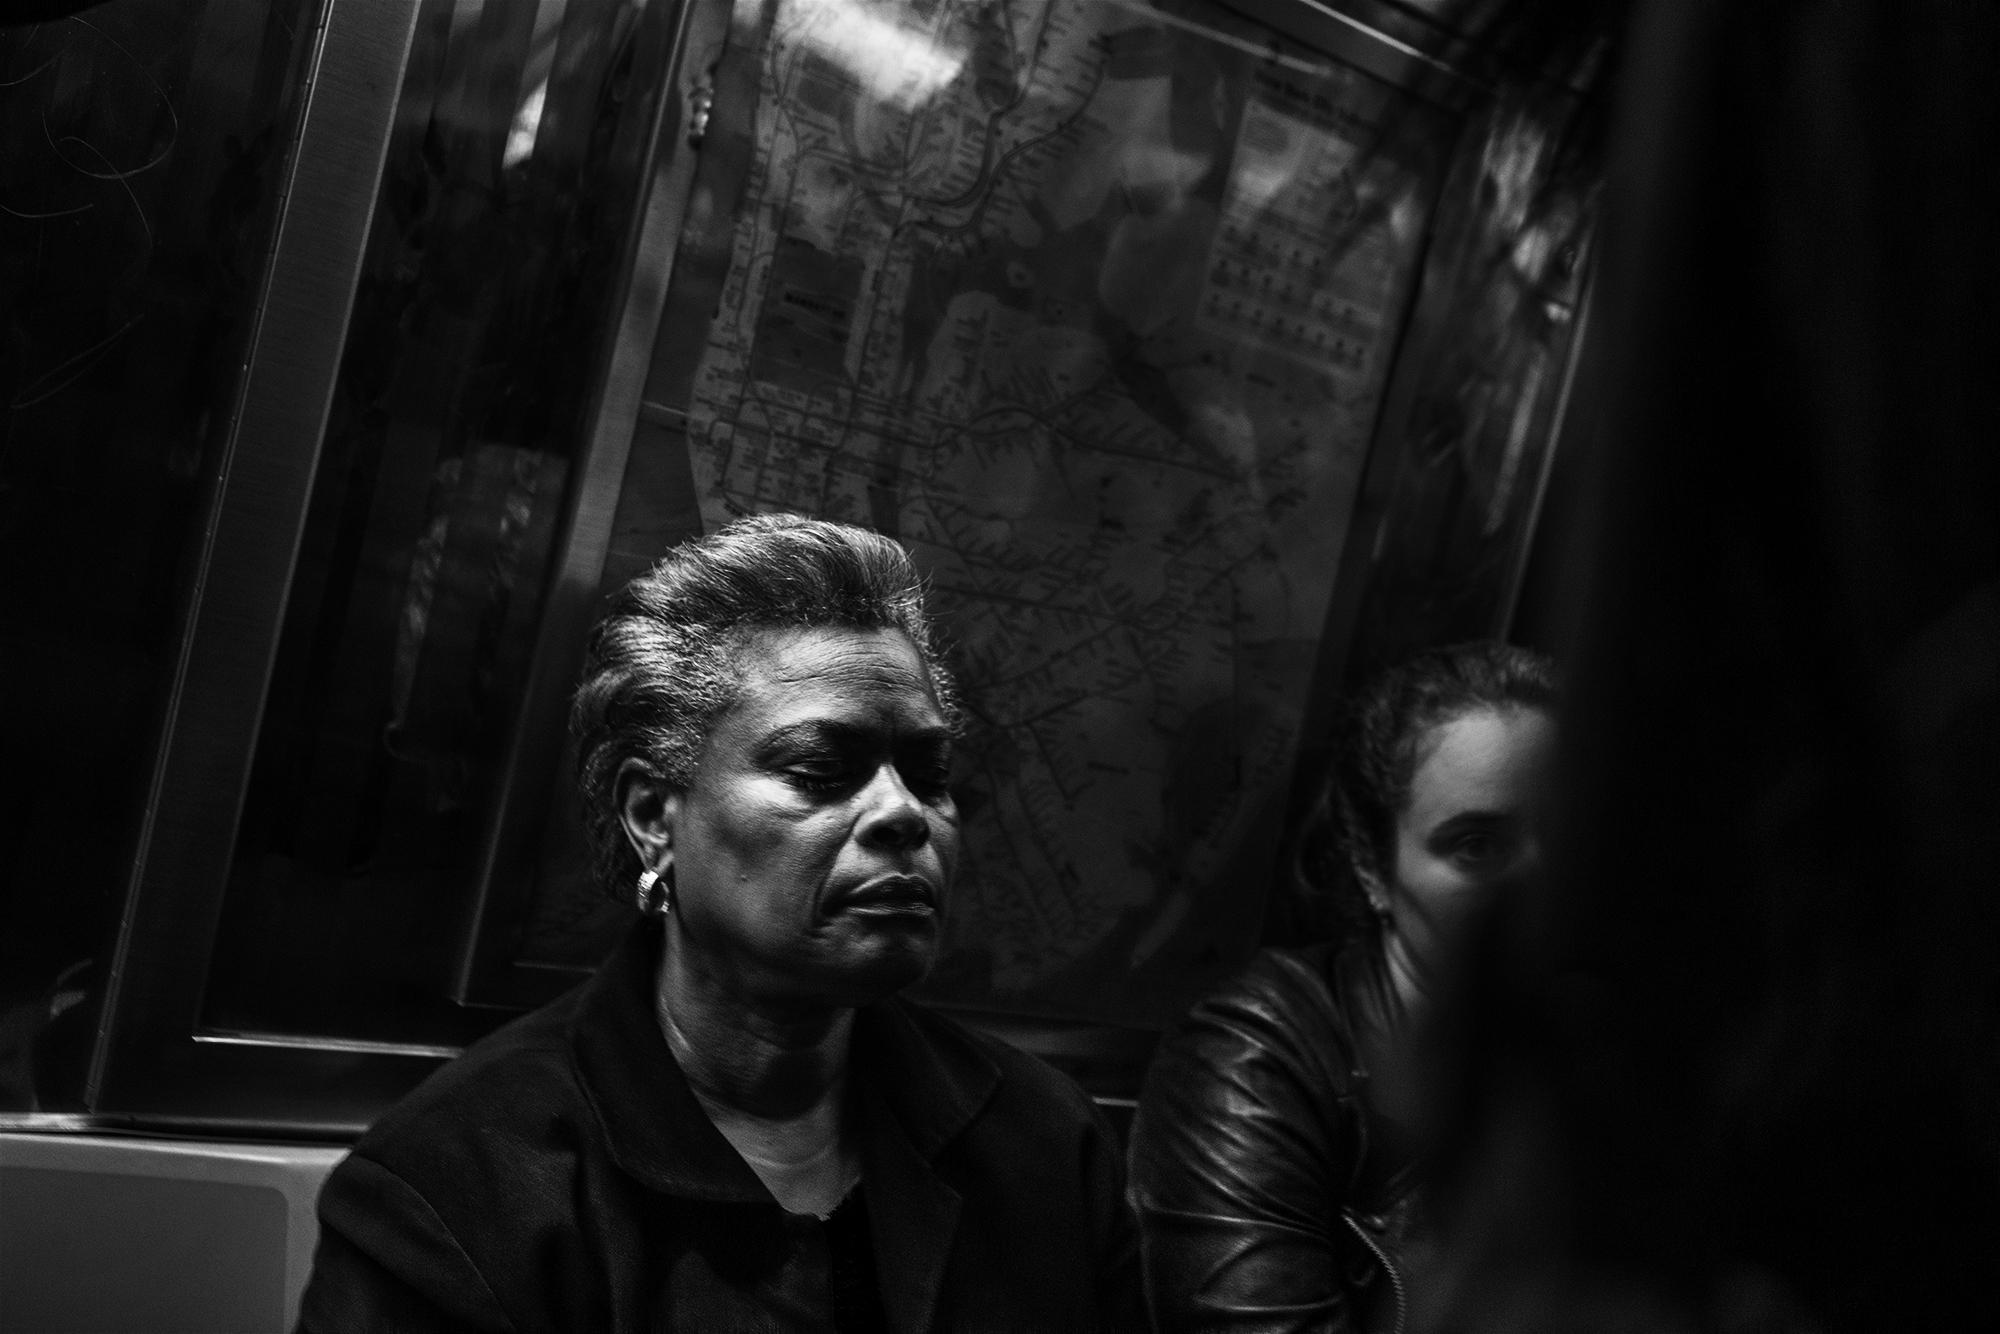 NYC_Subway_2018_Silver_Hair_Lady-001.jpg